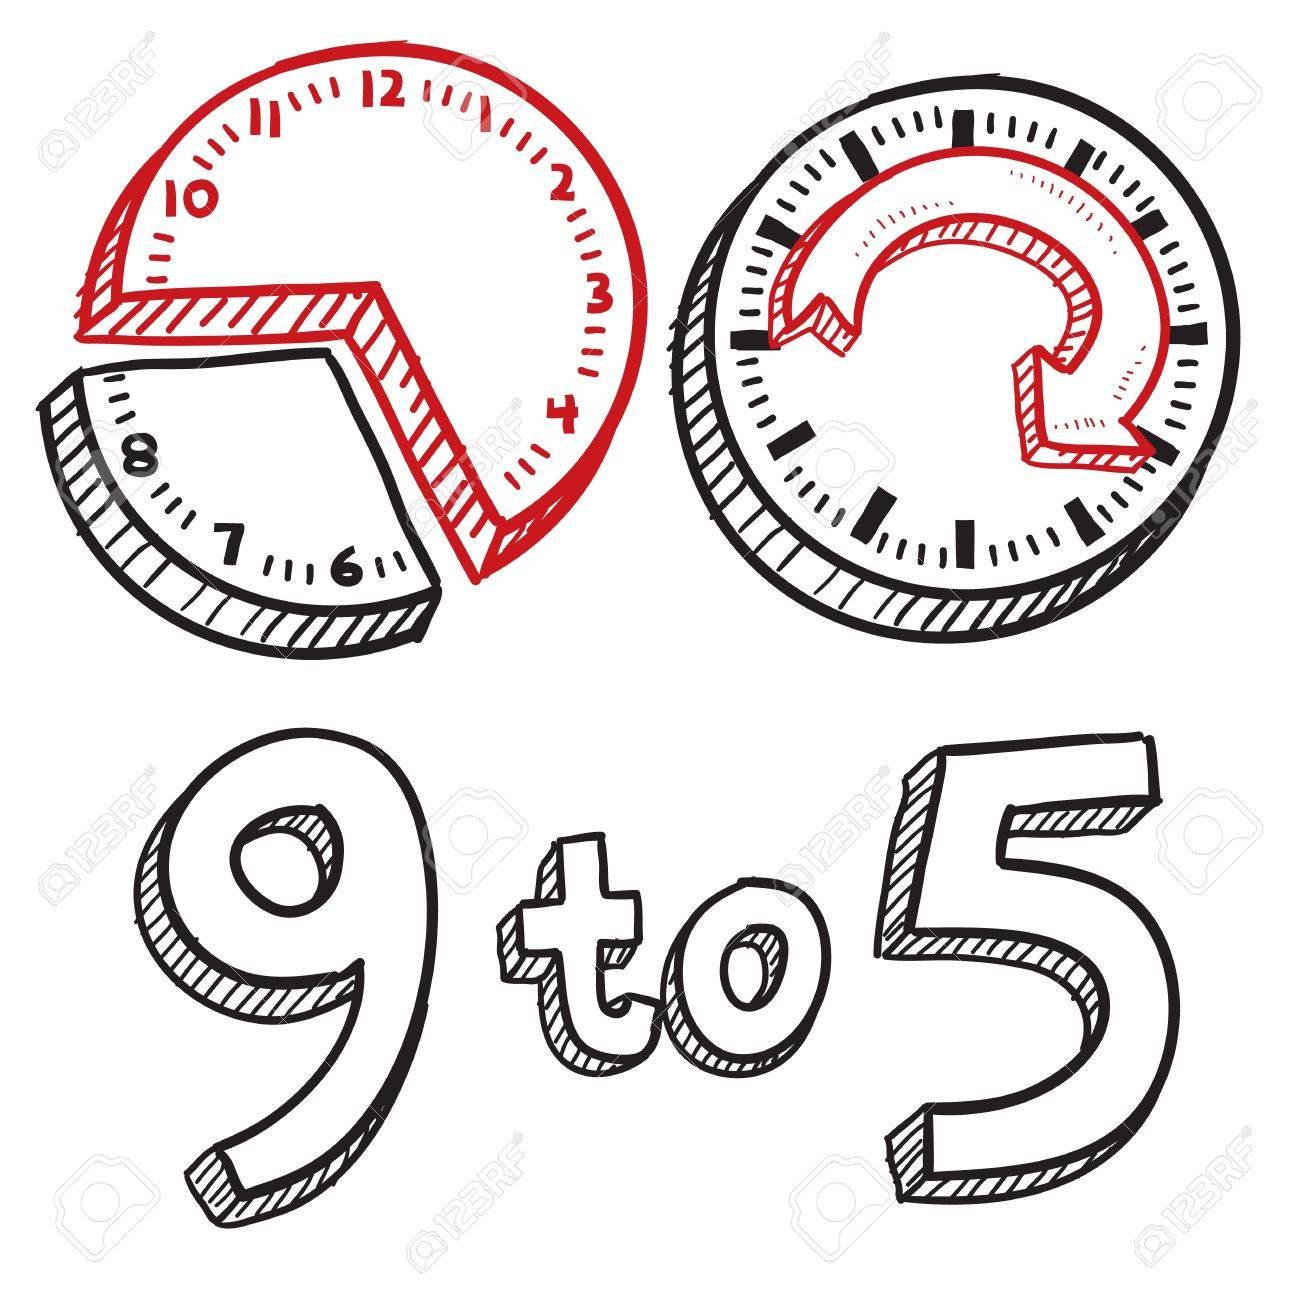 Image result for 9-5 job